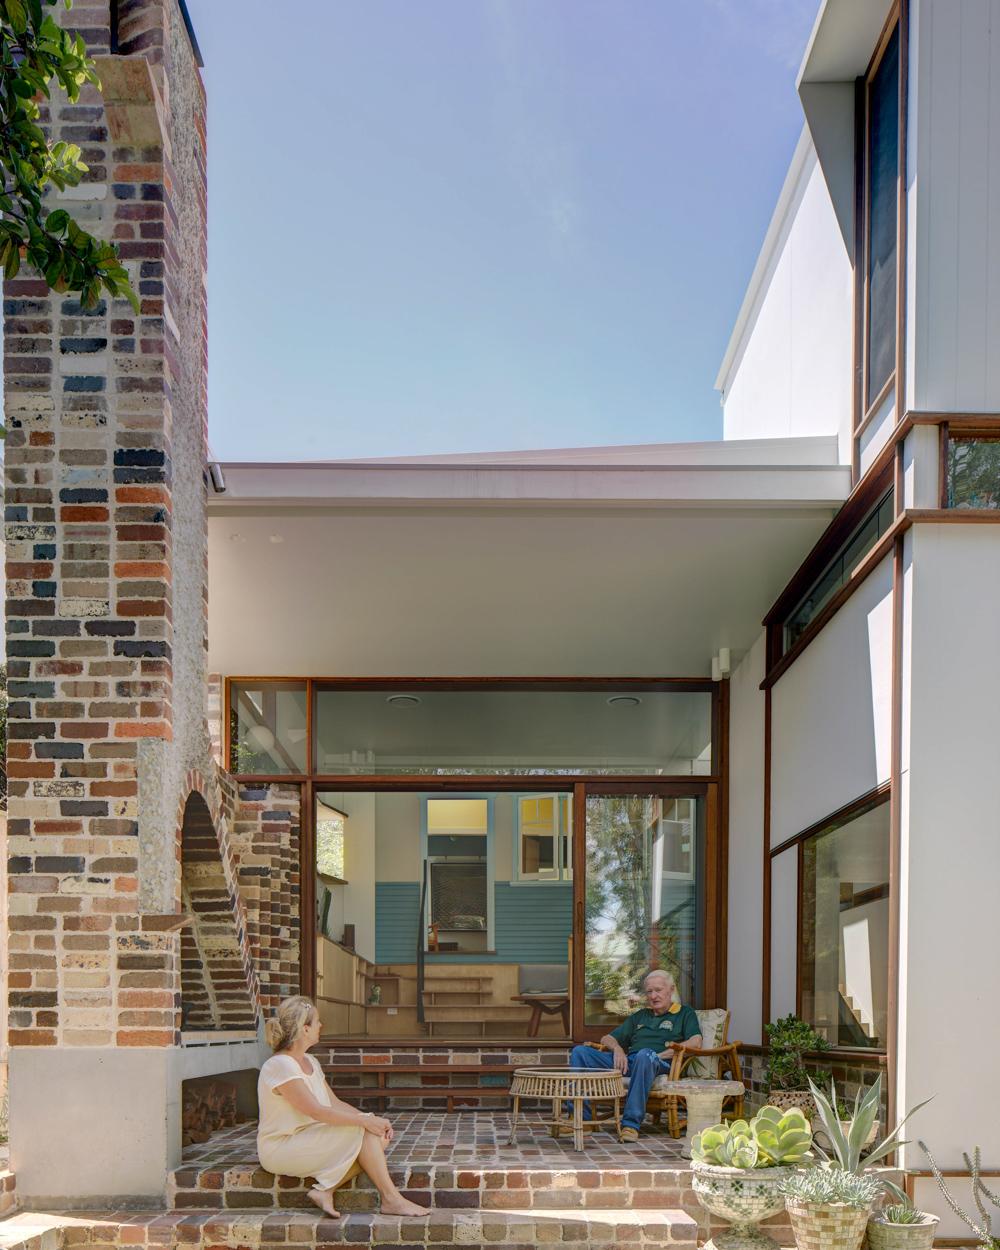 Home outdoor area ideas